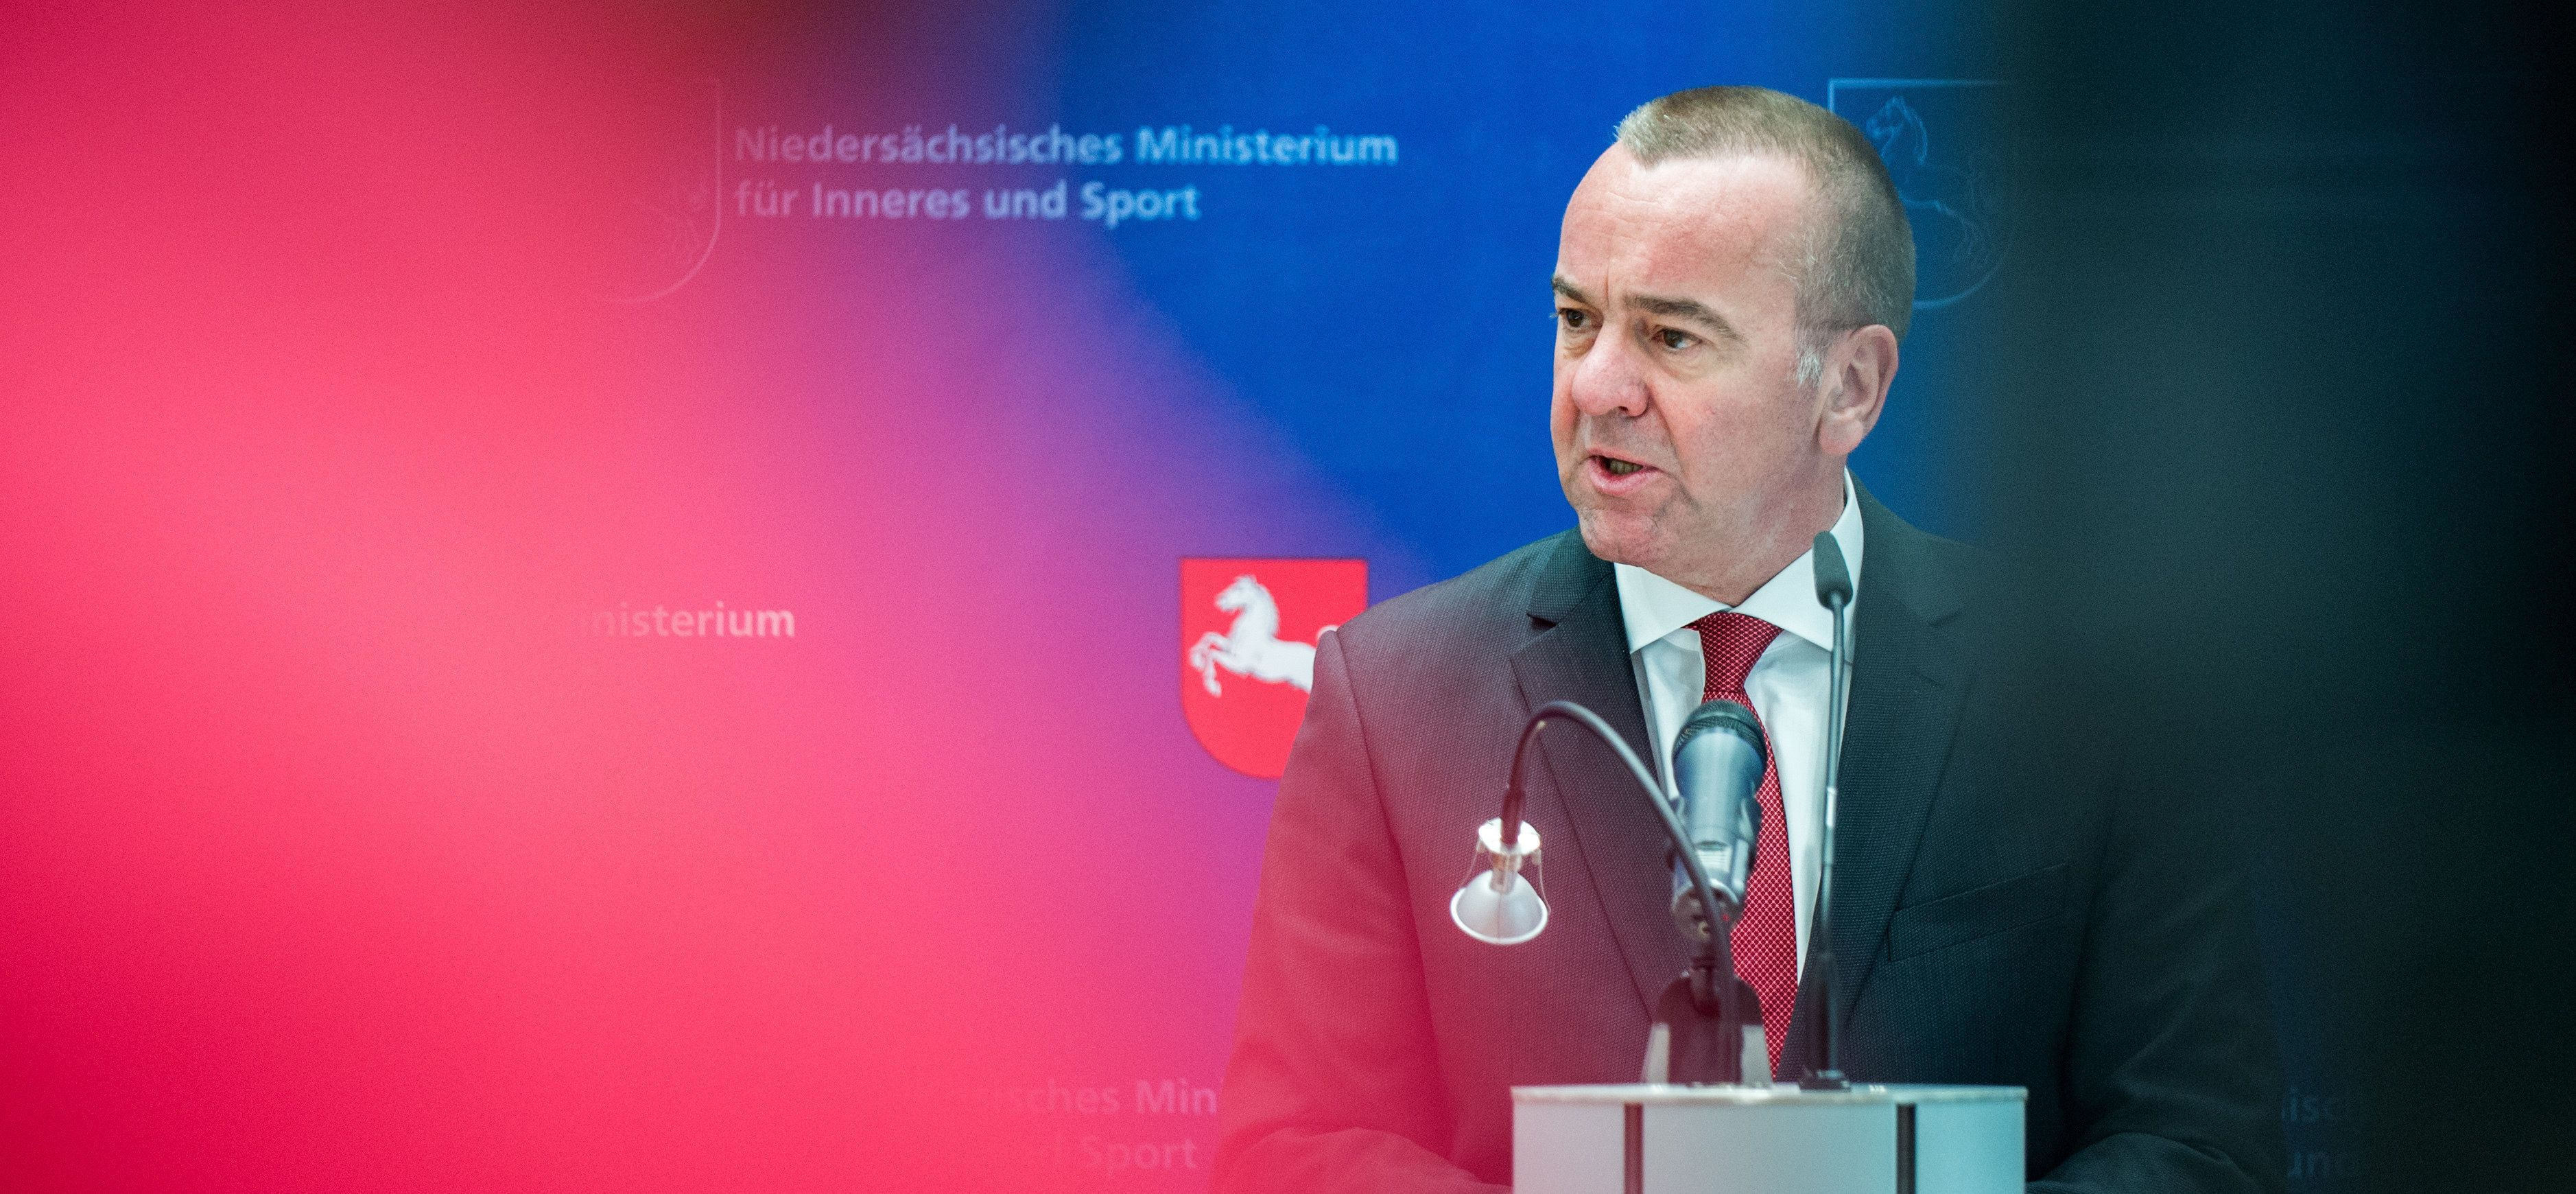 Top-News To Go: Niedersachsens Innenminister kritisiert Flüchtlingspolitik als